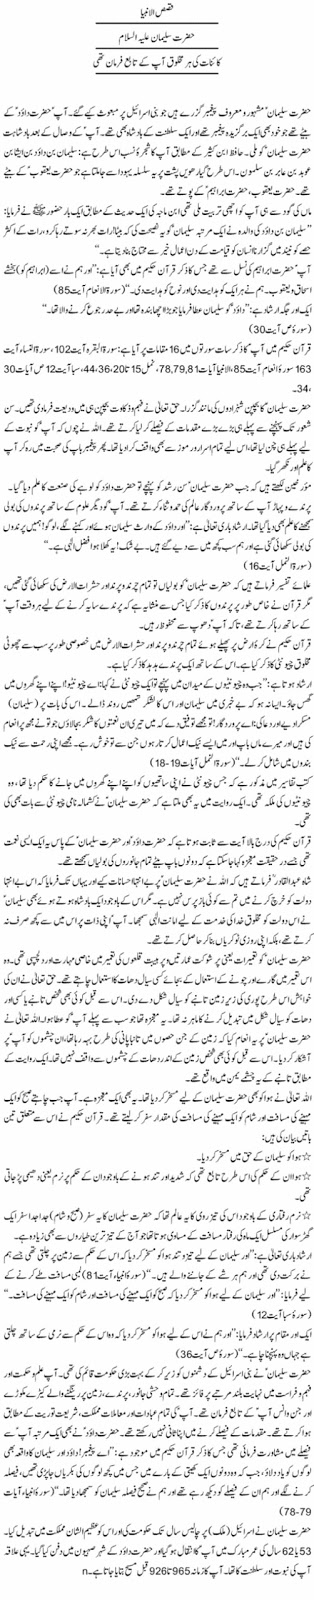 Suleman a.s In Urdu. Brief history of the Prophet Suleman a.s in Urdu